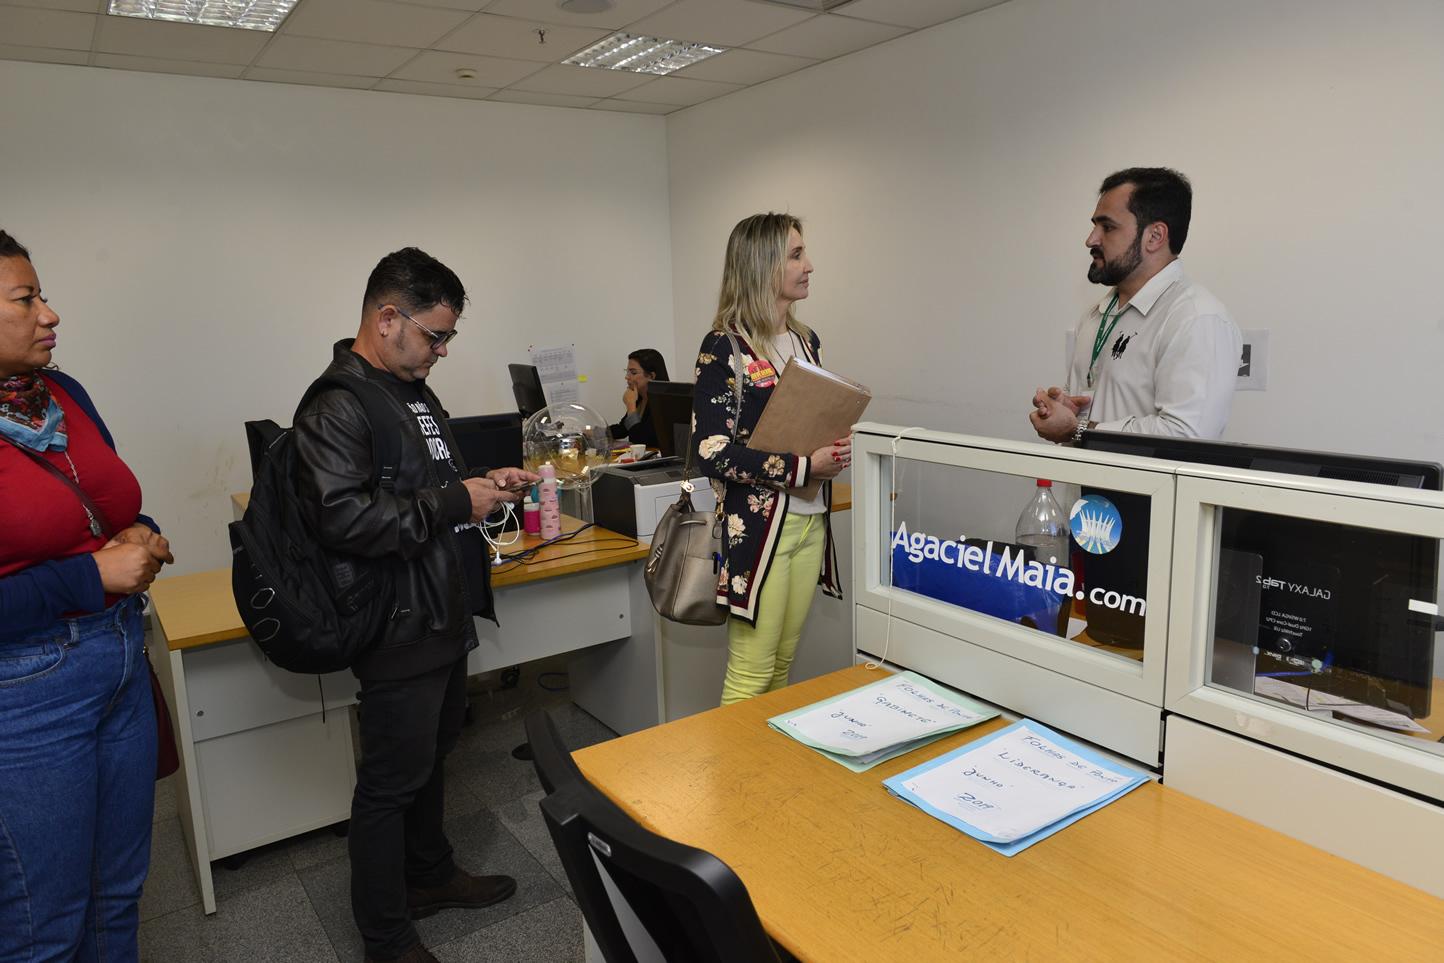 2019.06.13_Visita-aos-gabinetes-contra-o-fim-da-licenca-premio_fotos-Deva-Garcia-5